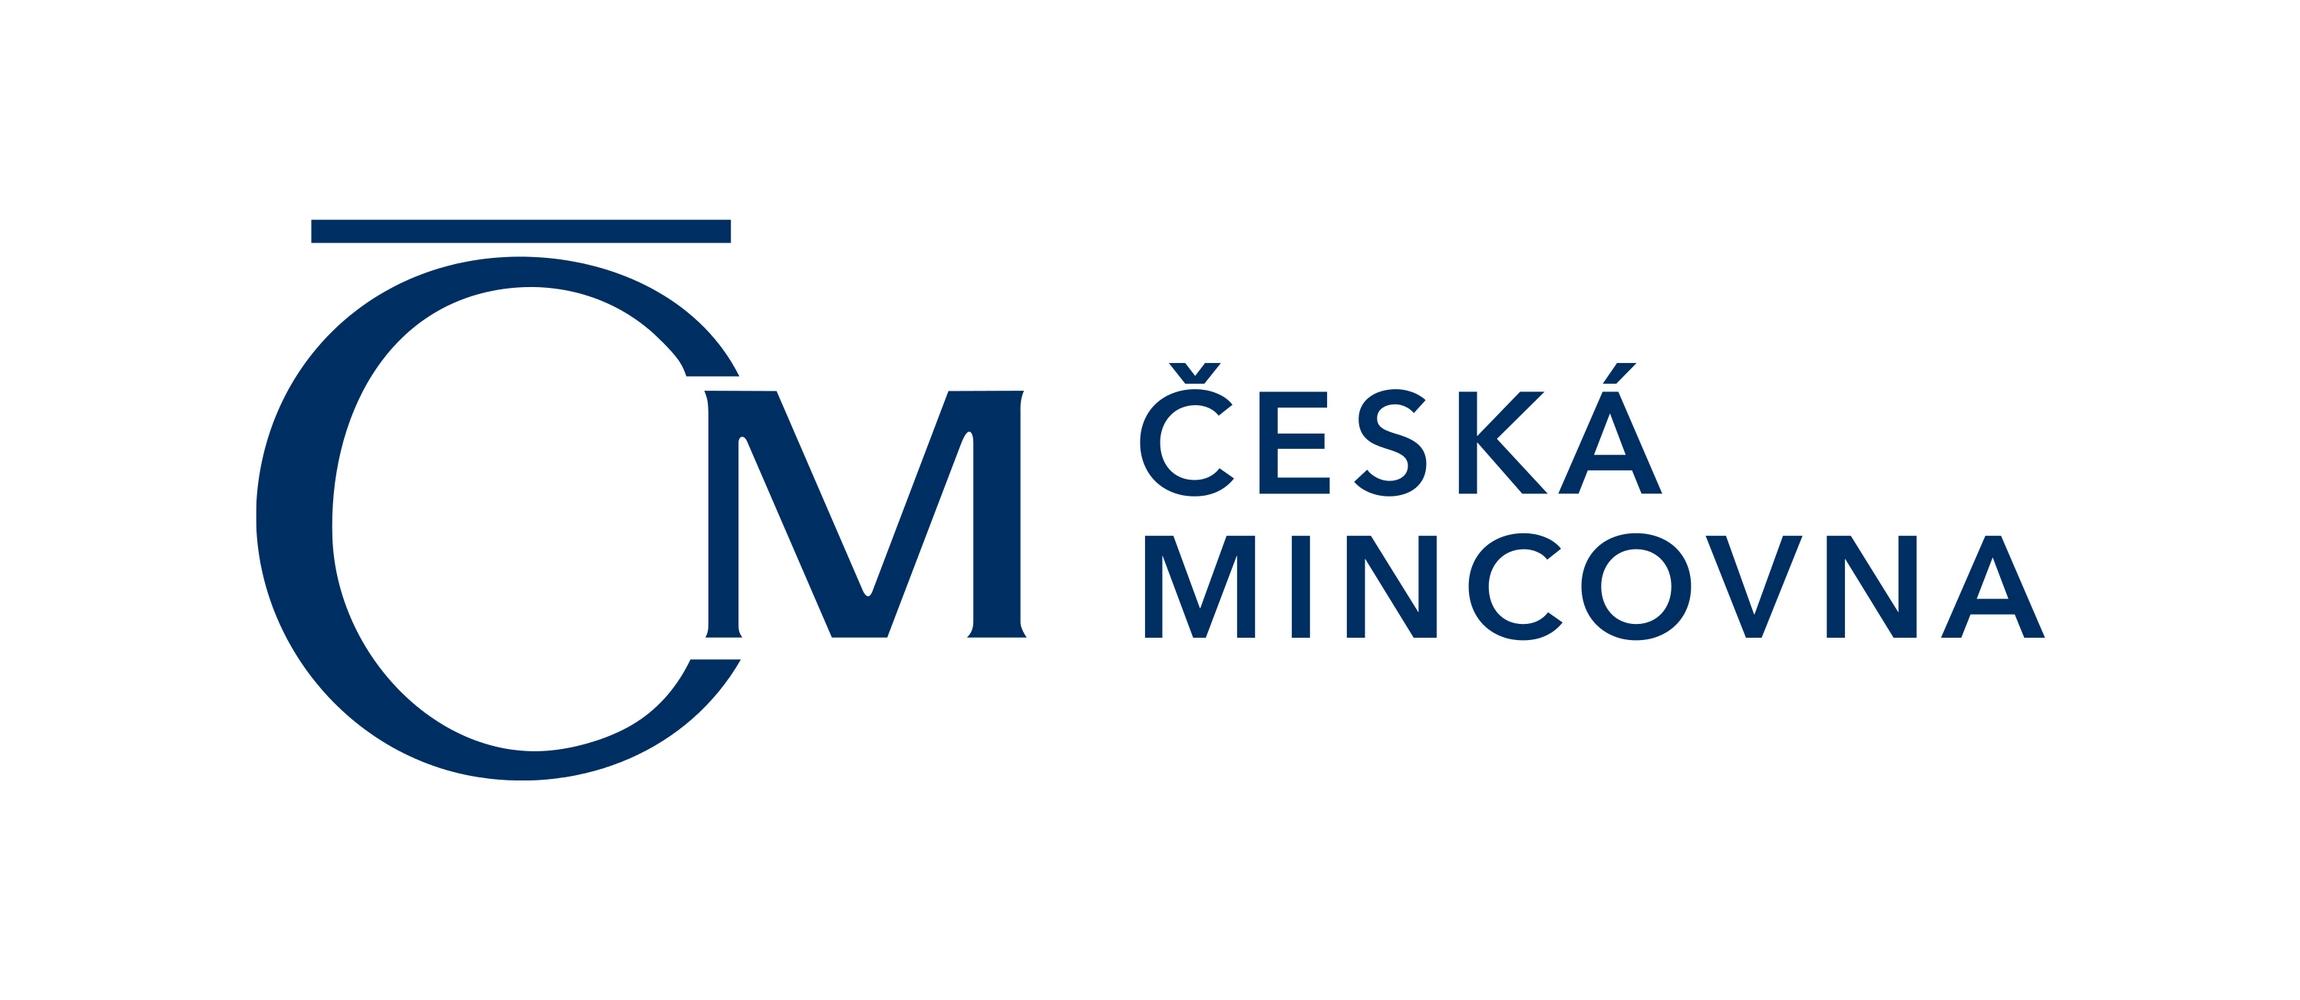 CM_logo.jpg (148 KB)